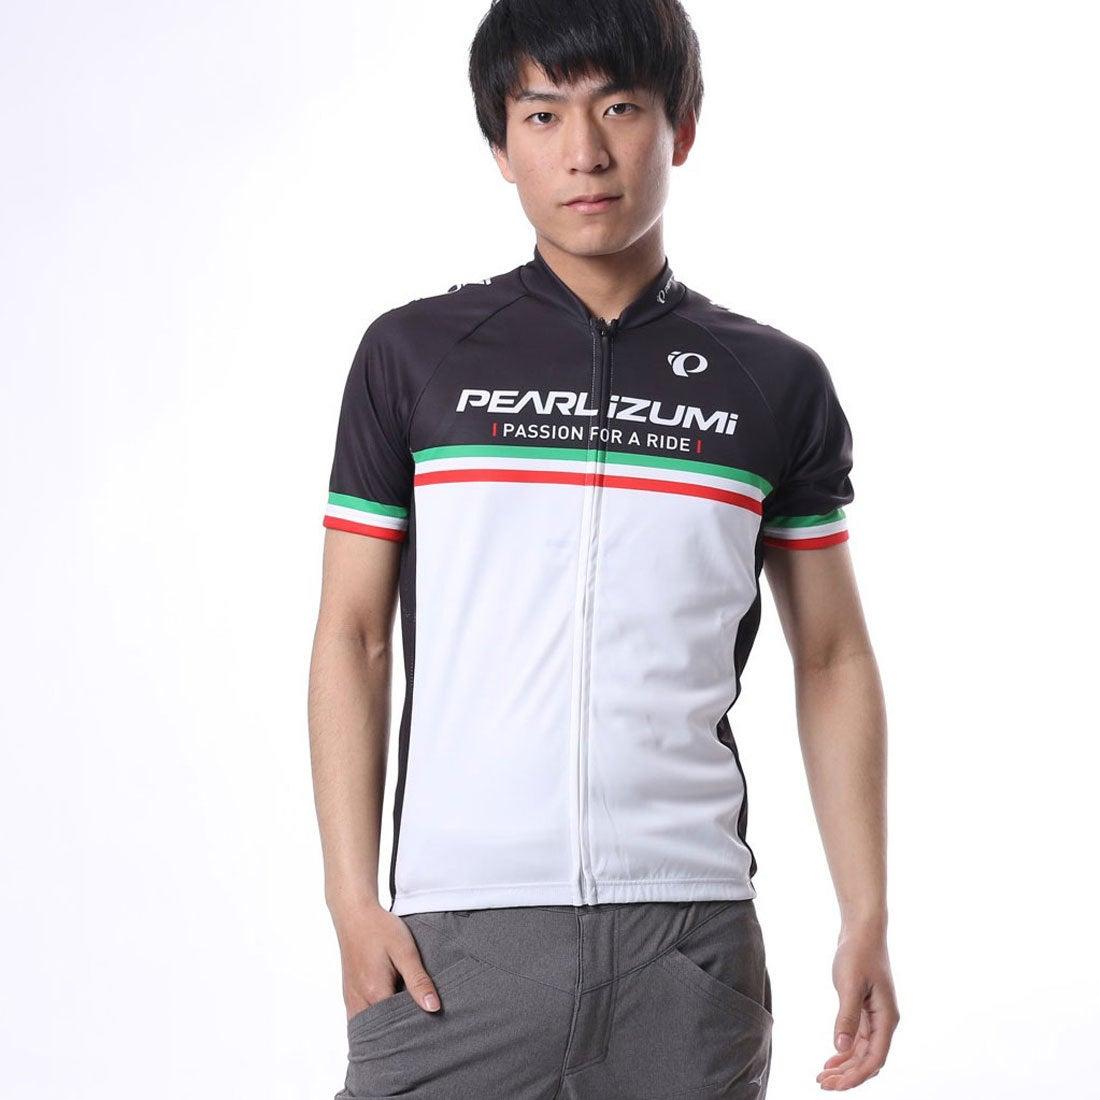 【SALE 30%OFF】パールイズミ PEARL iZUMi メンズ バイシクル サイクルジャージ/ジャケット プリントジャージ 621B-34-M メンズ